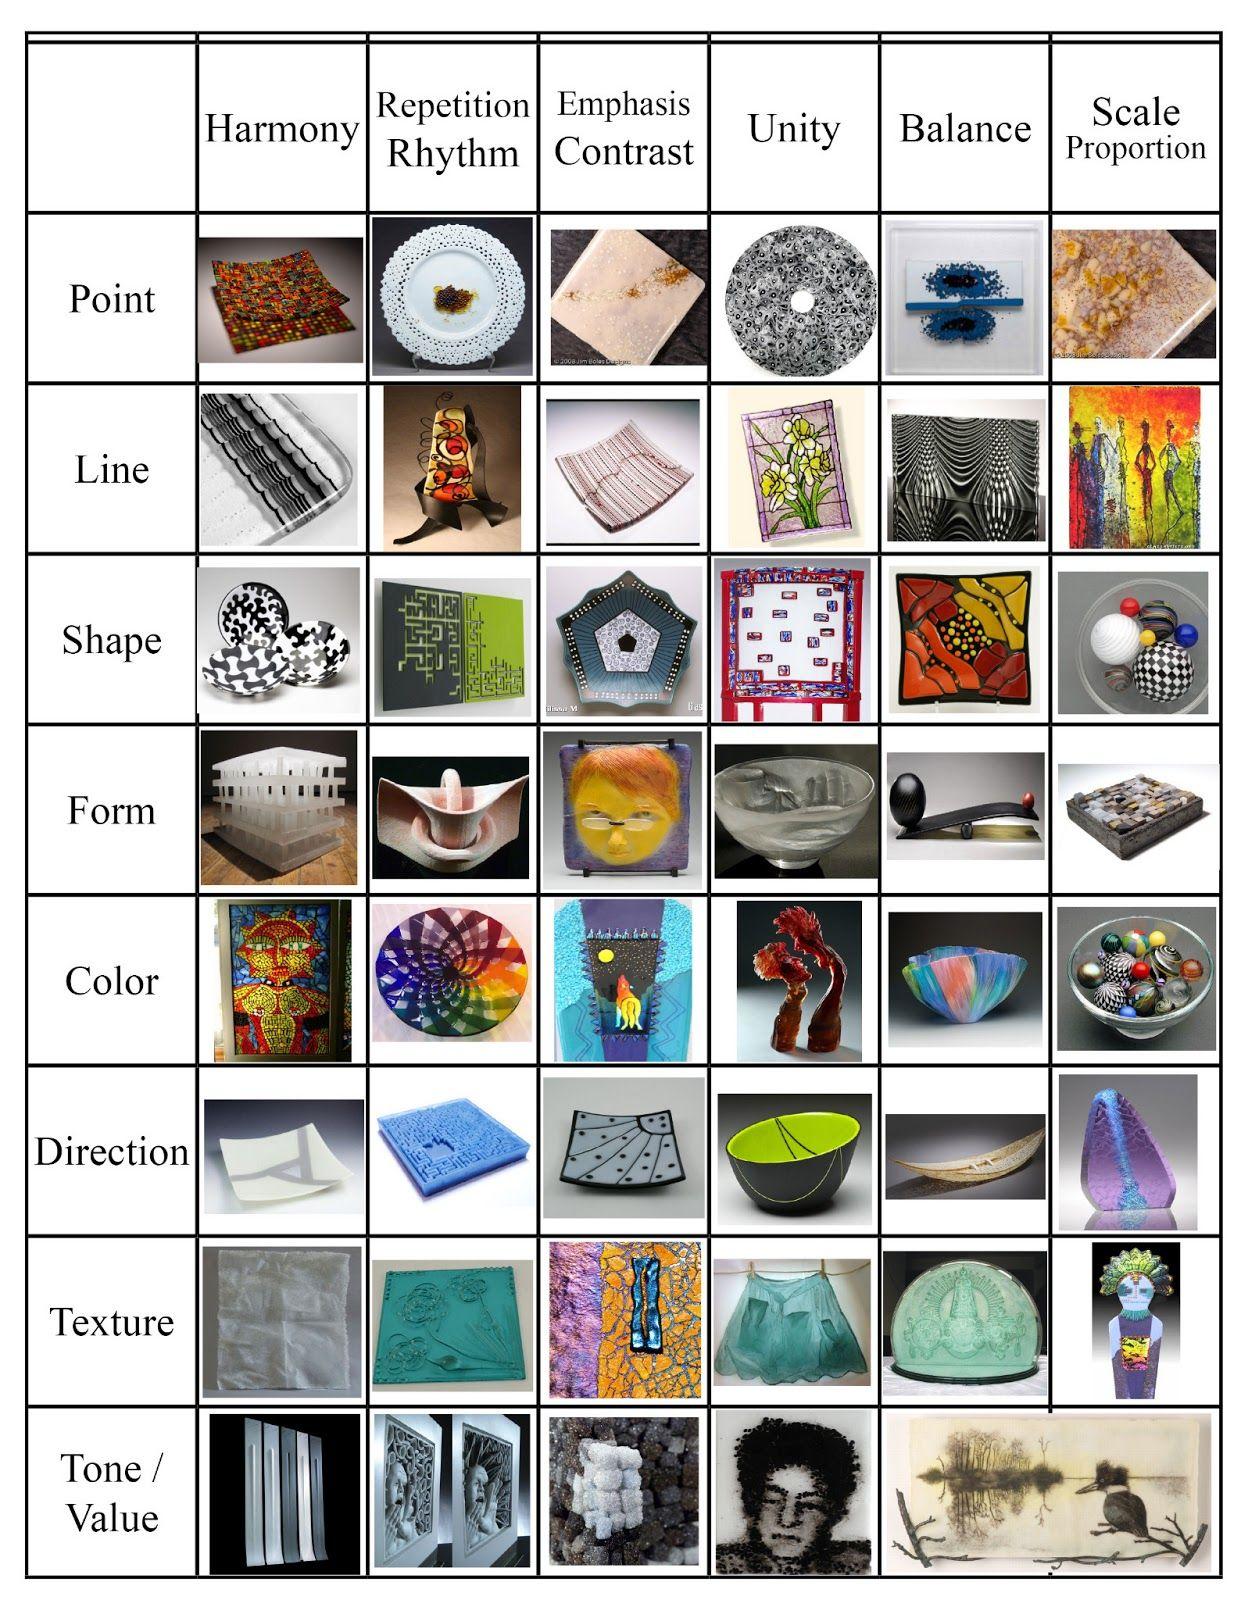 Elements Amp Principles Of Design In Glass Art Image Making